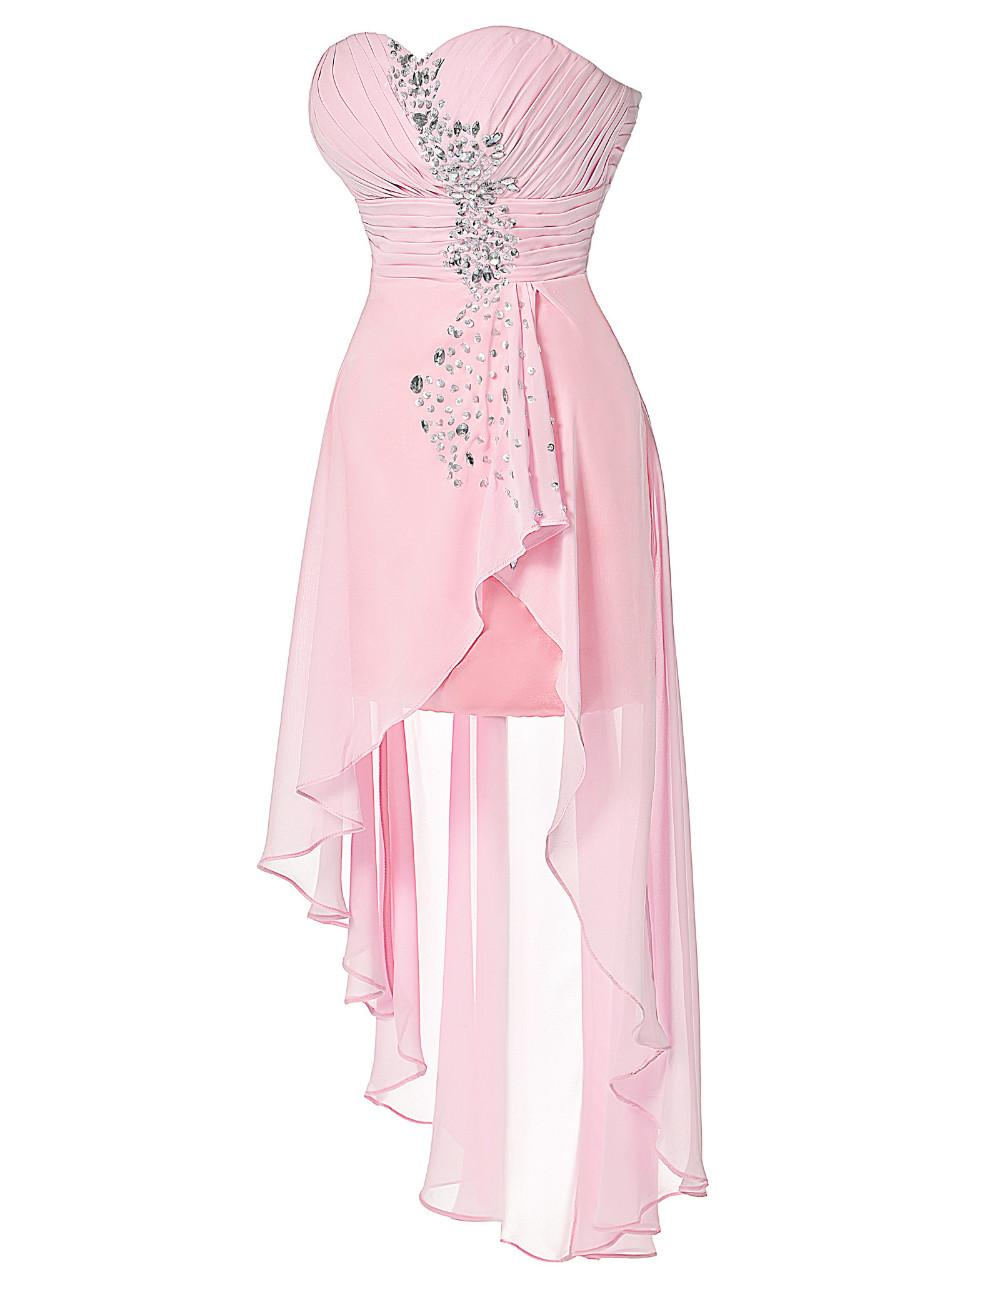 HTB1n8ZcKVXXXXbsXXXXq6xXFXXXNHigh Low Short Front Long Back Strapless Dress